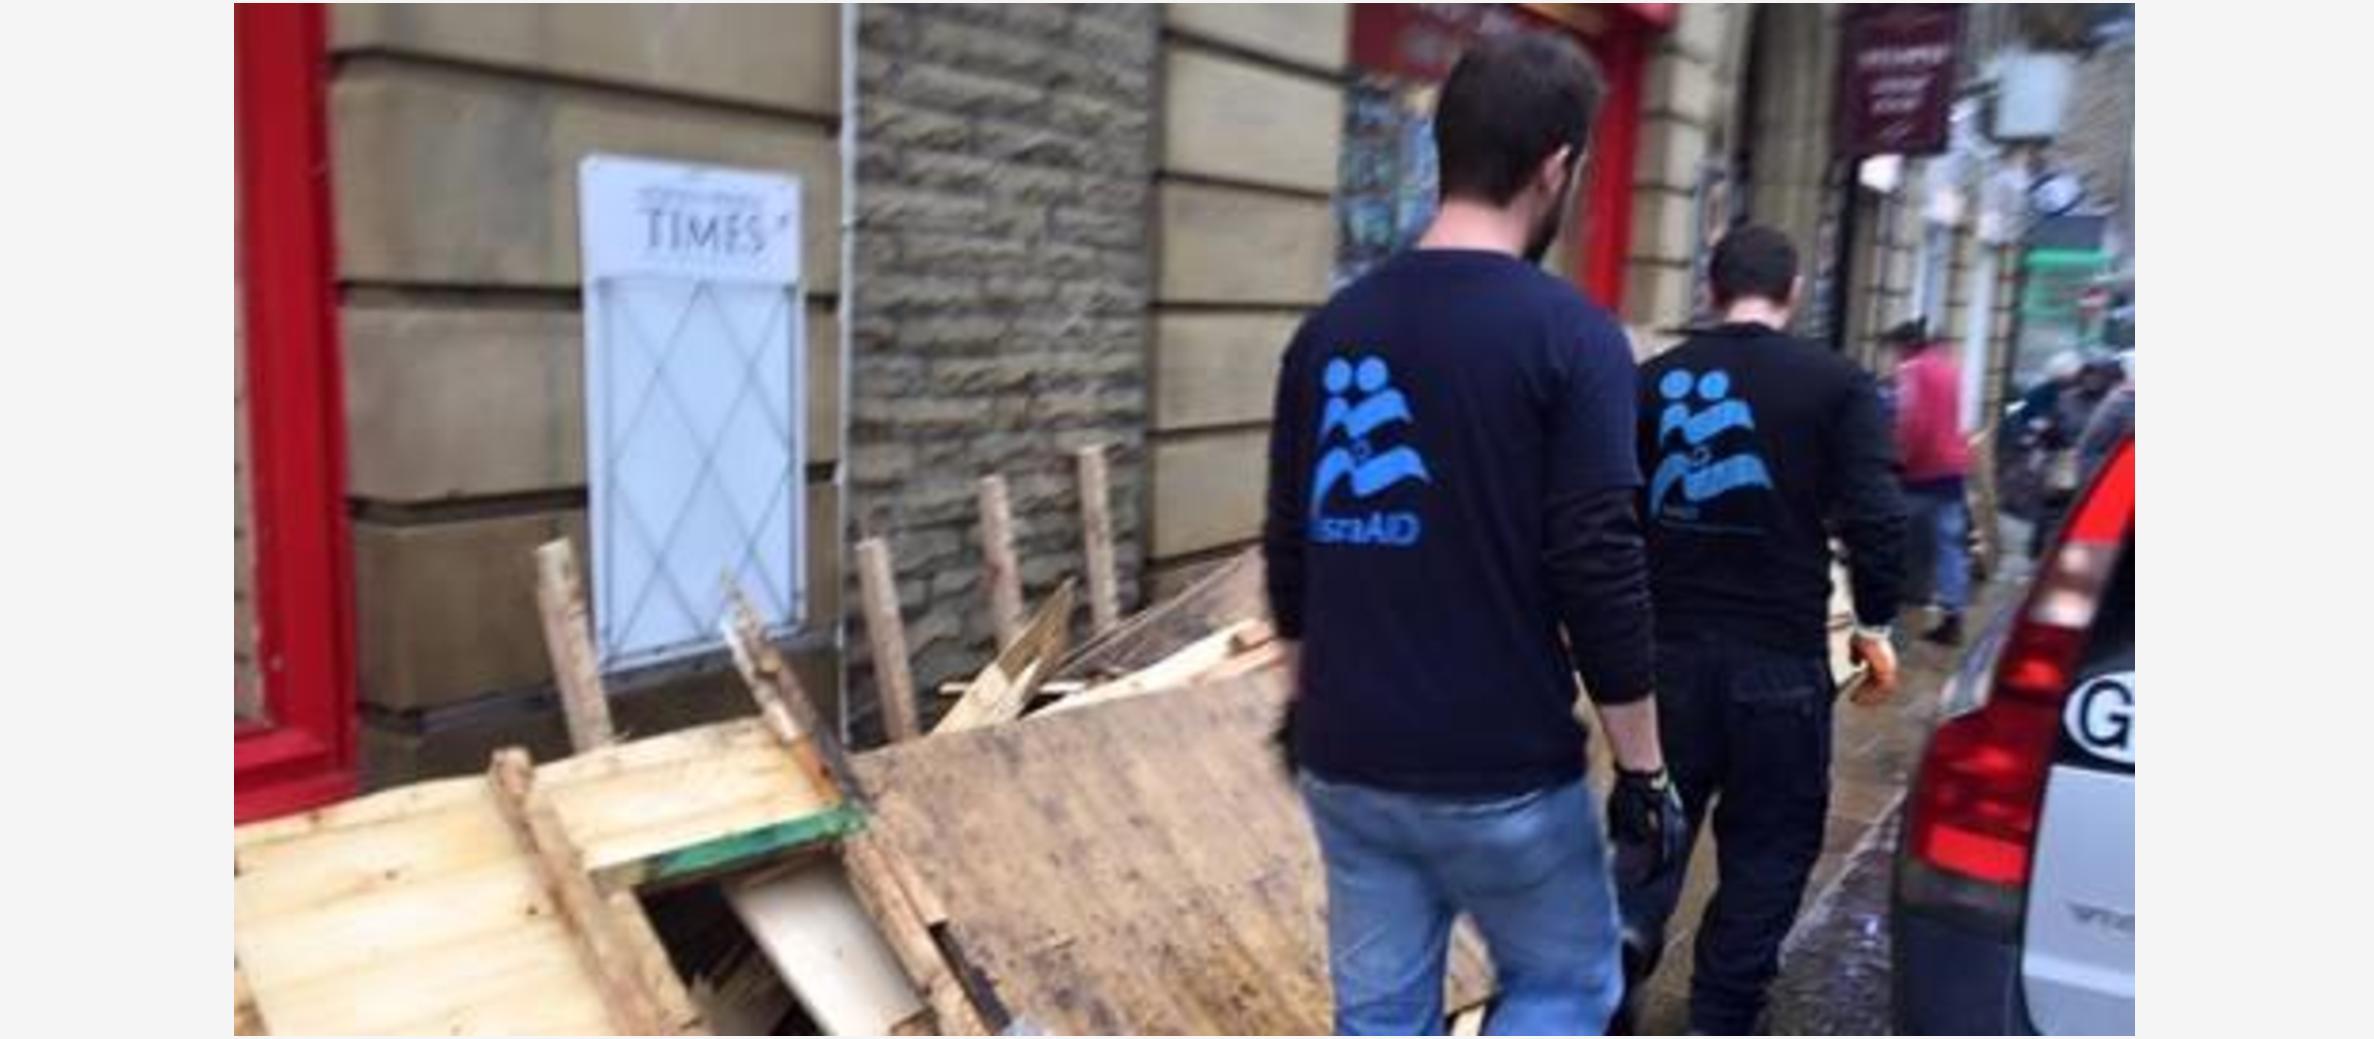 Lord Mayor of Leeds praises Israeli charity's flood response; team now moves to Scotland